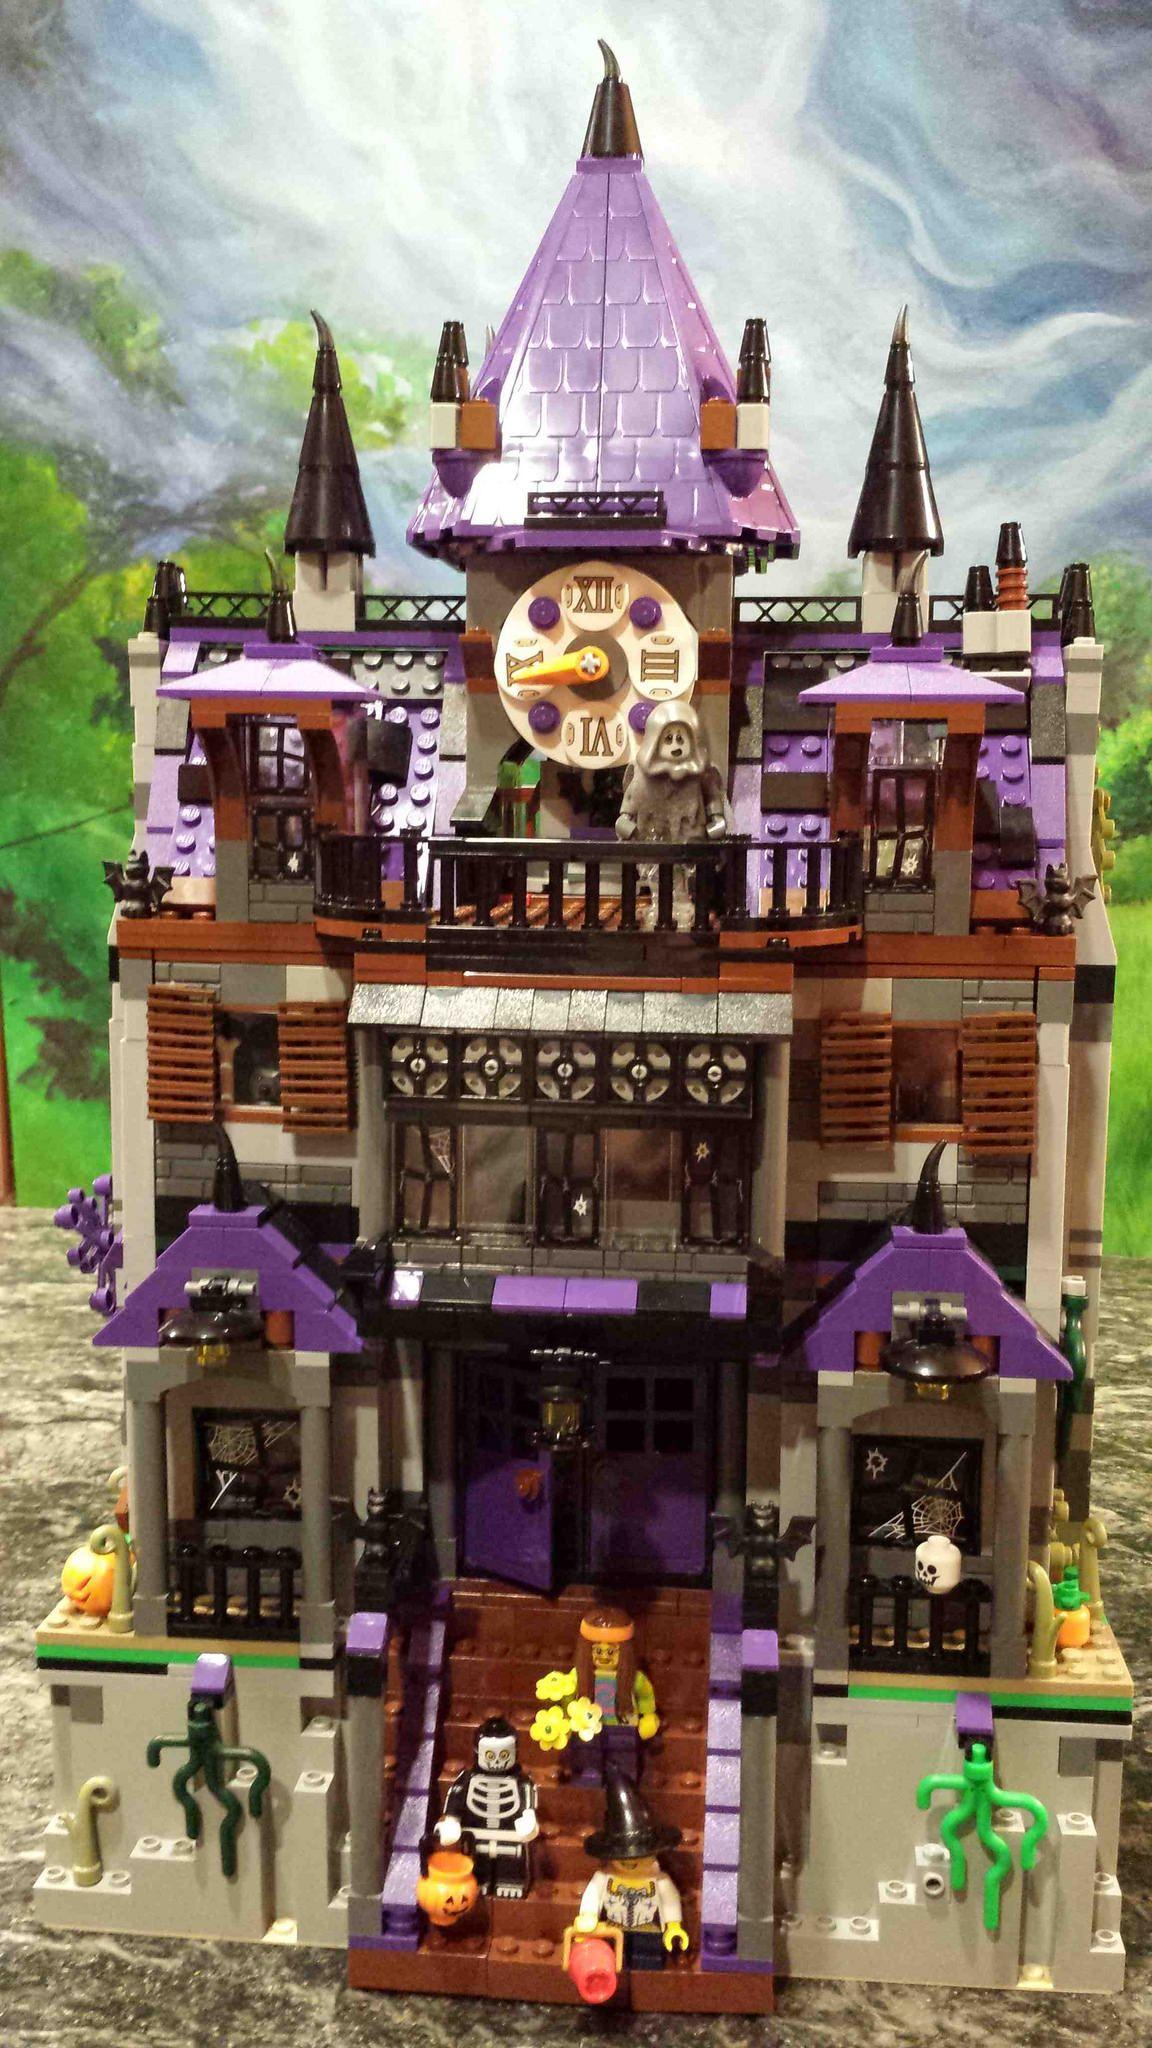 Https Flic Kr P Zew1oj Haunted House 5 Lego Haunted House